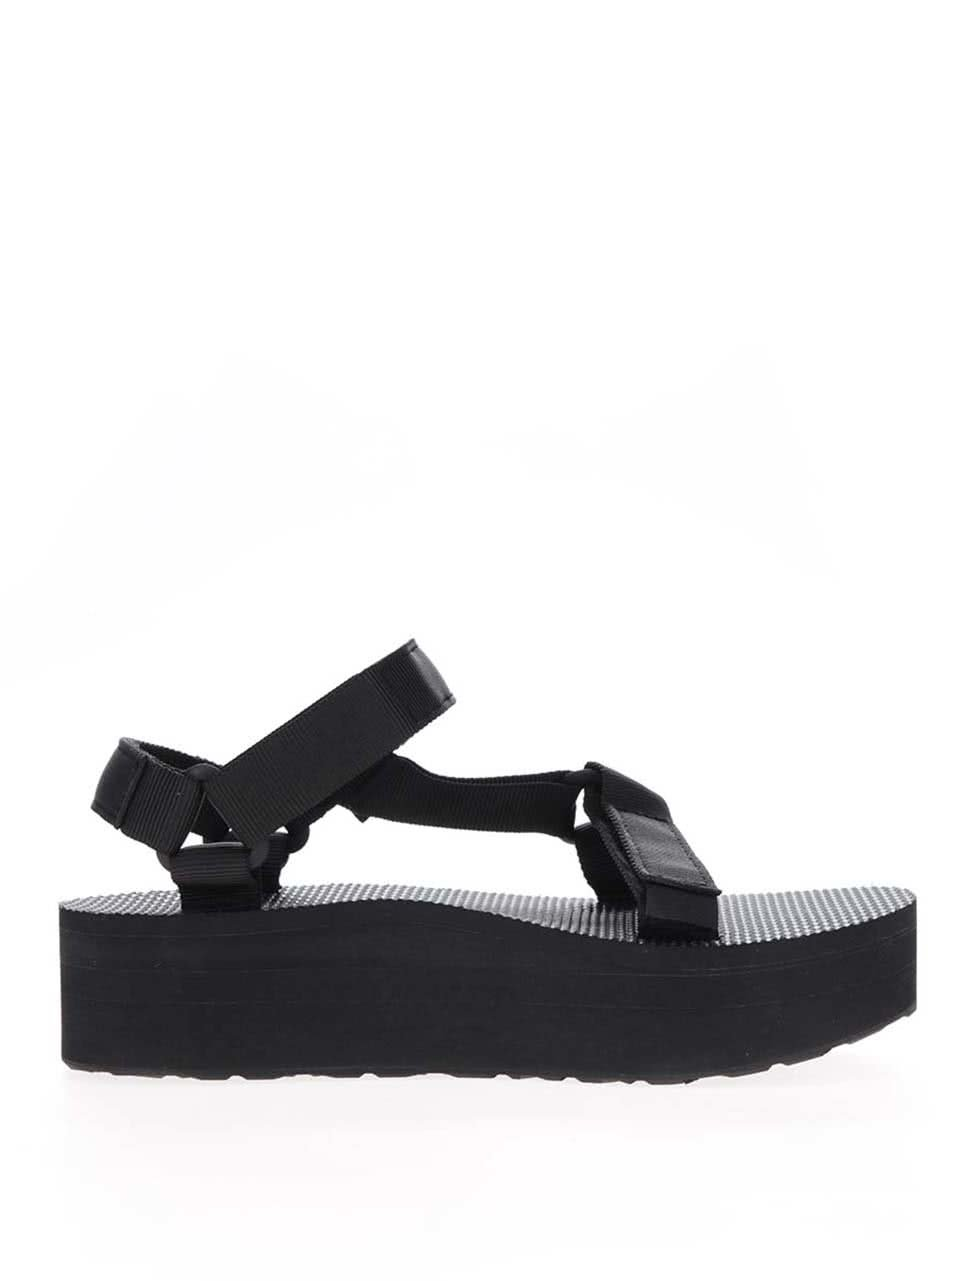 Čierne dámske sandále na platforme Teva ... f5d6e3c31a1